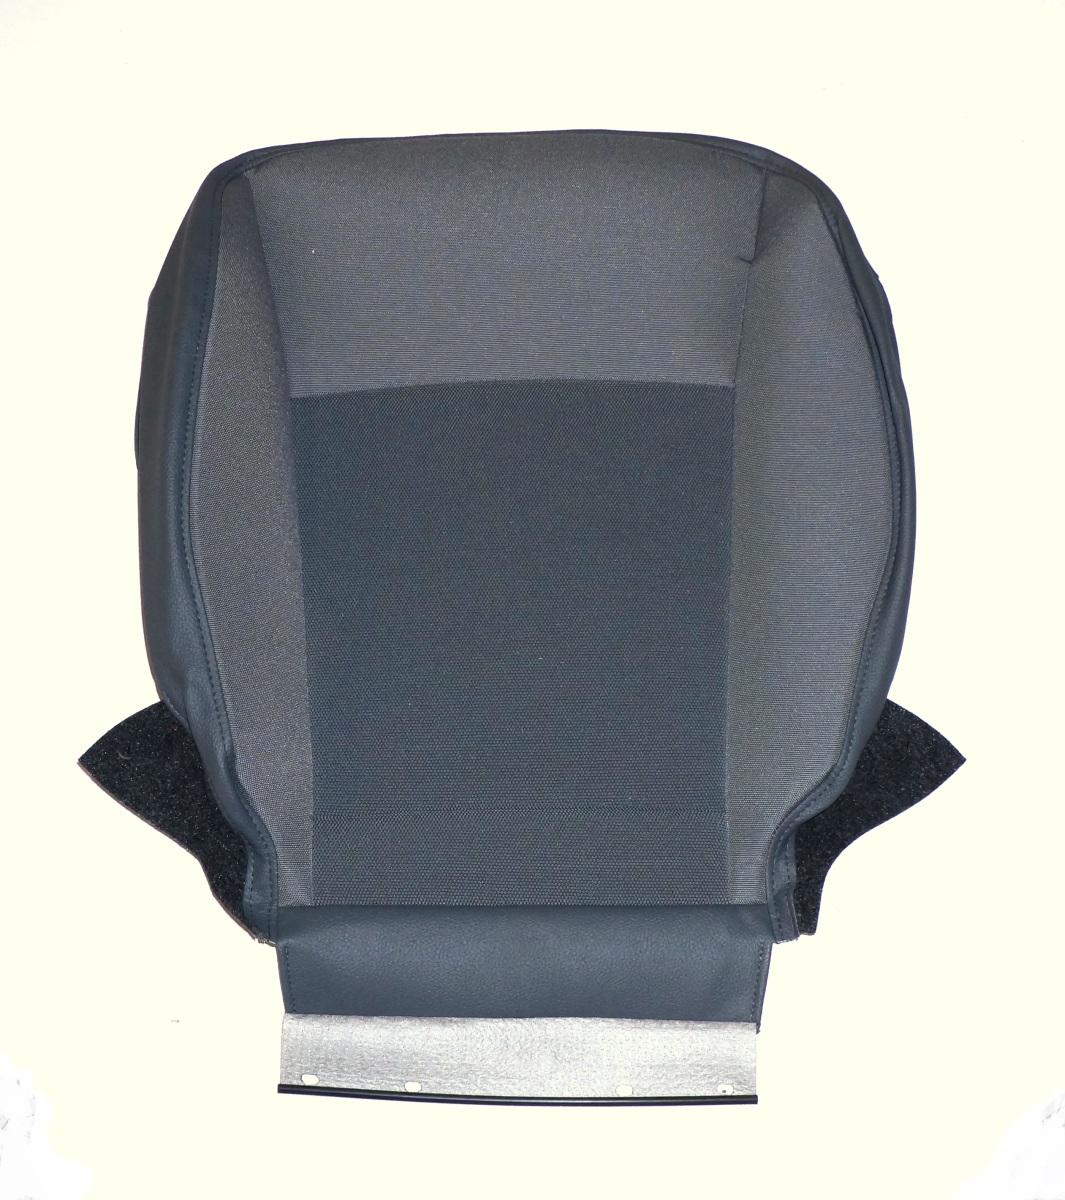 12757610 SAAB K01K30 Seat Cover Front Bottom RH